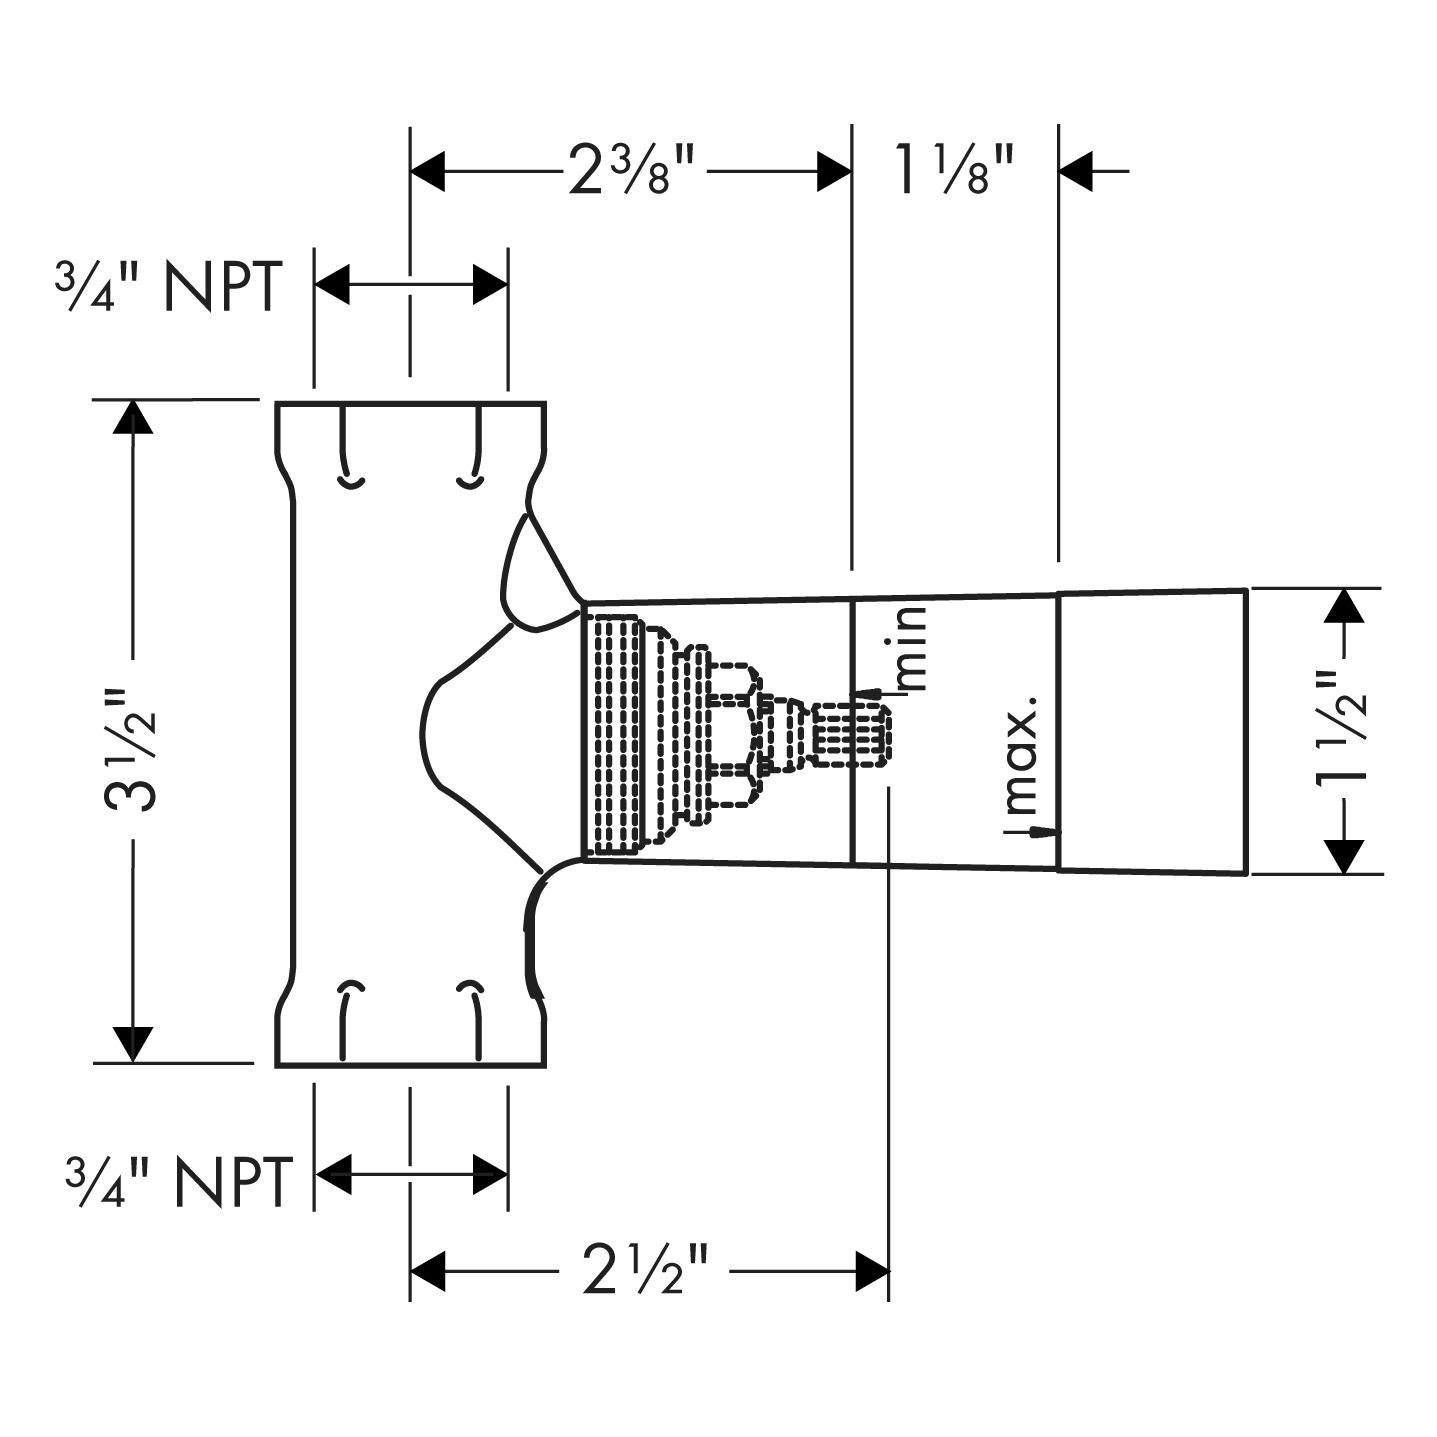 hansgrohe Shut-off valves: Rough, Volume Control, ¾